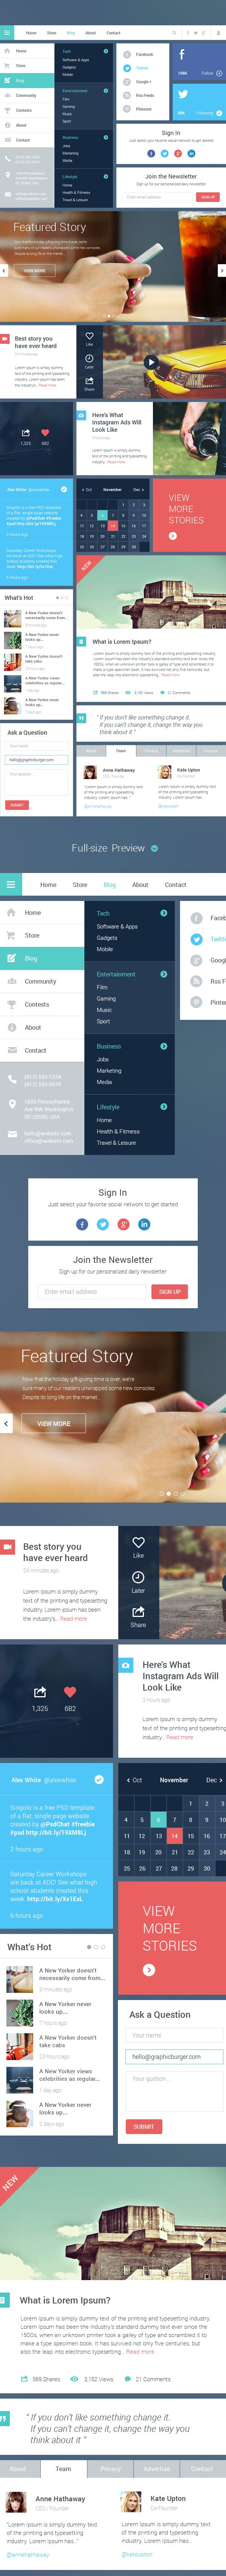 Blog/Magazine UI Kit #2 by GraphicBurger , via Behance